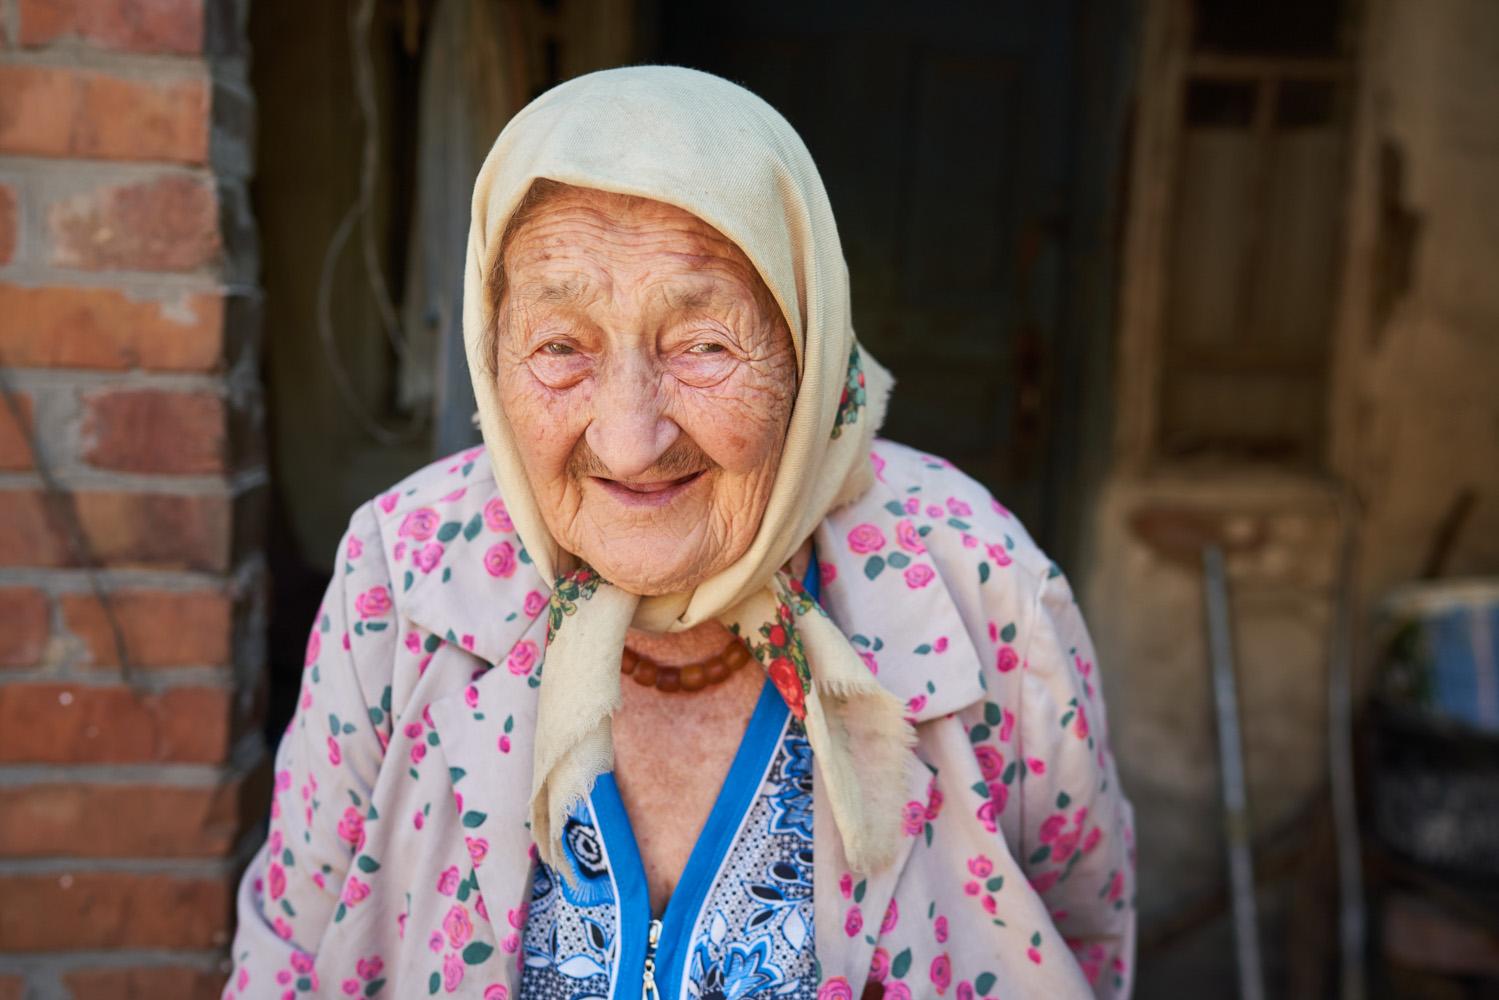 Holodomor eyewitness Marfa Kovalenko